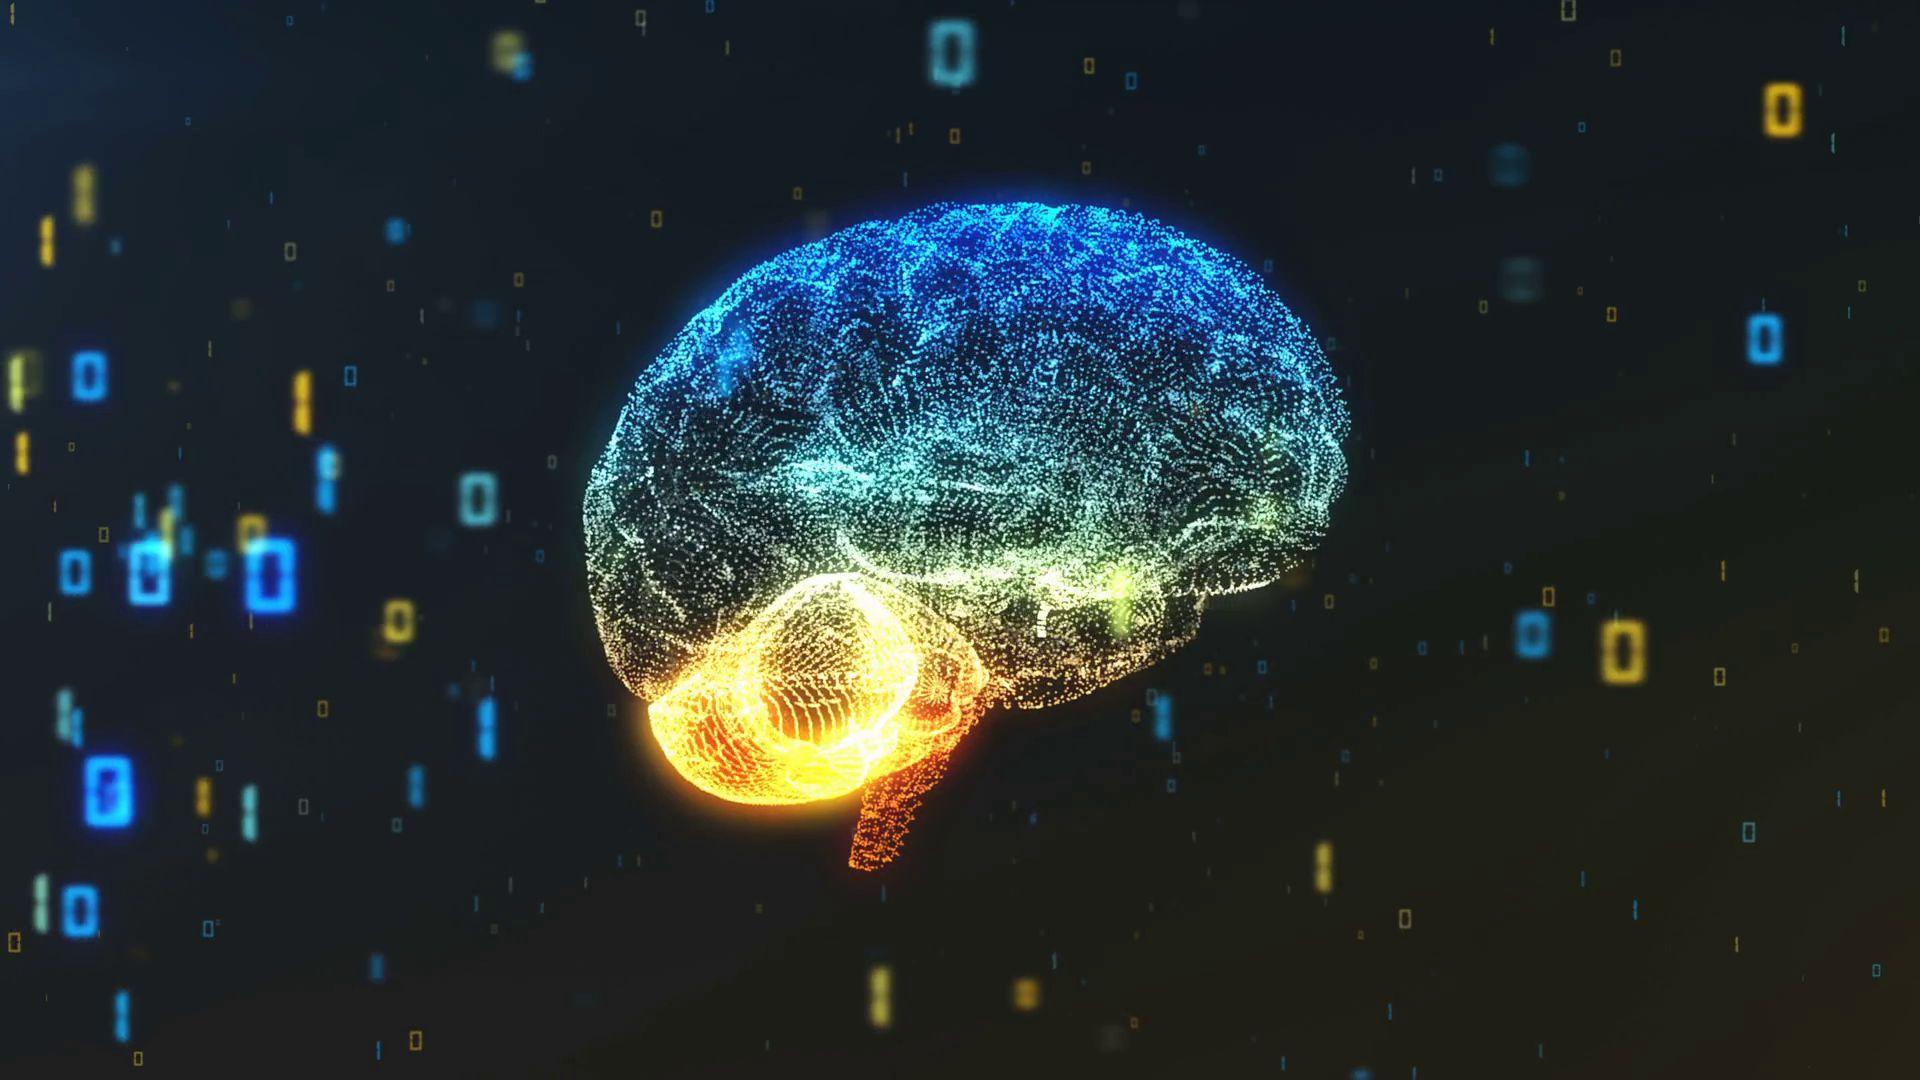 Brain wallpaper photo